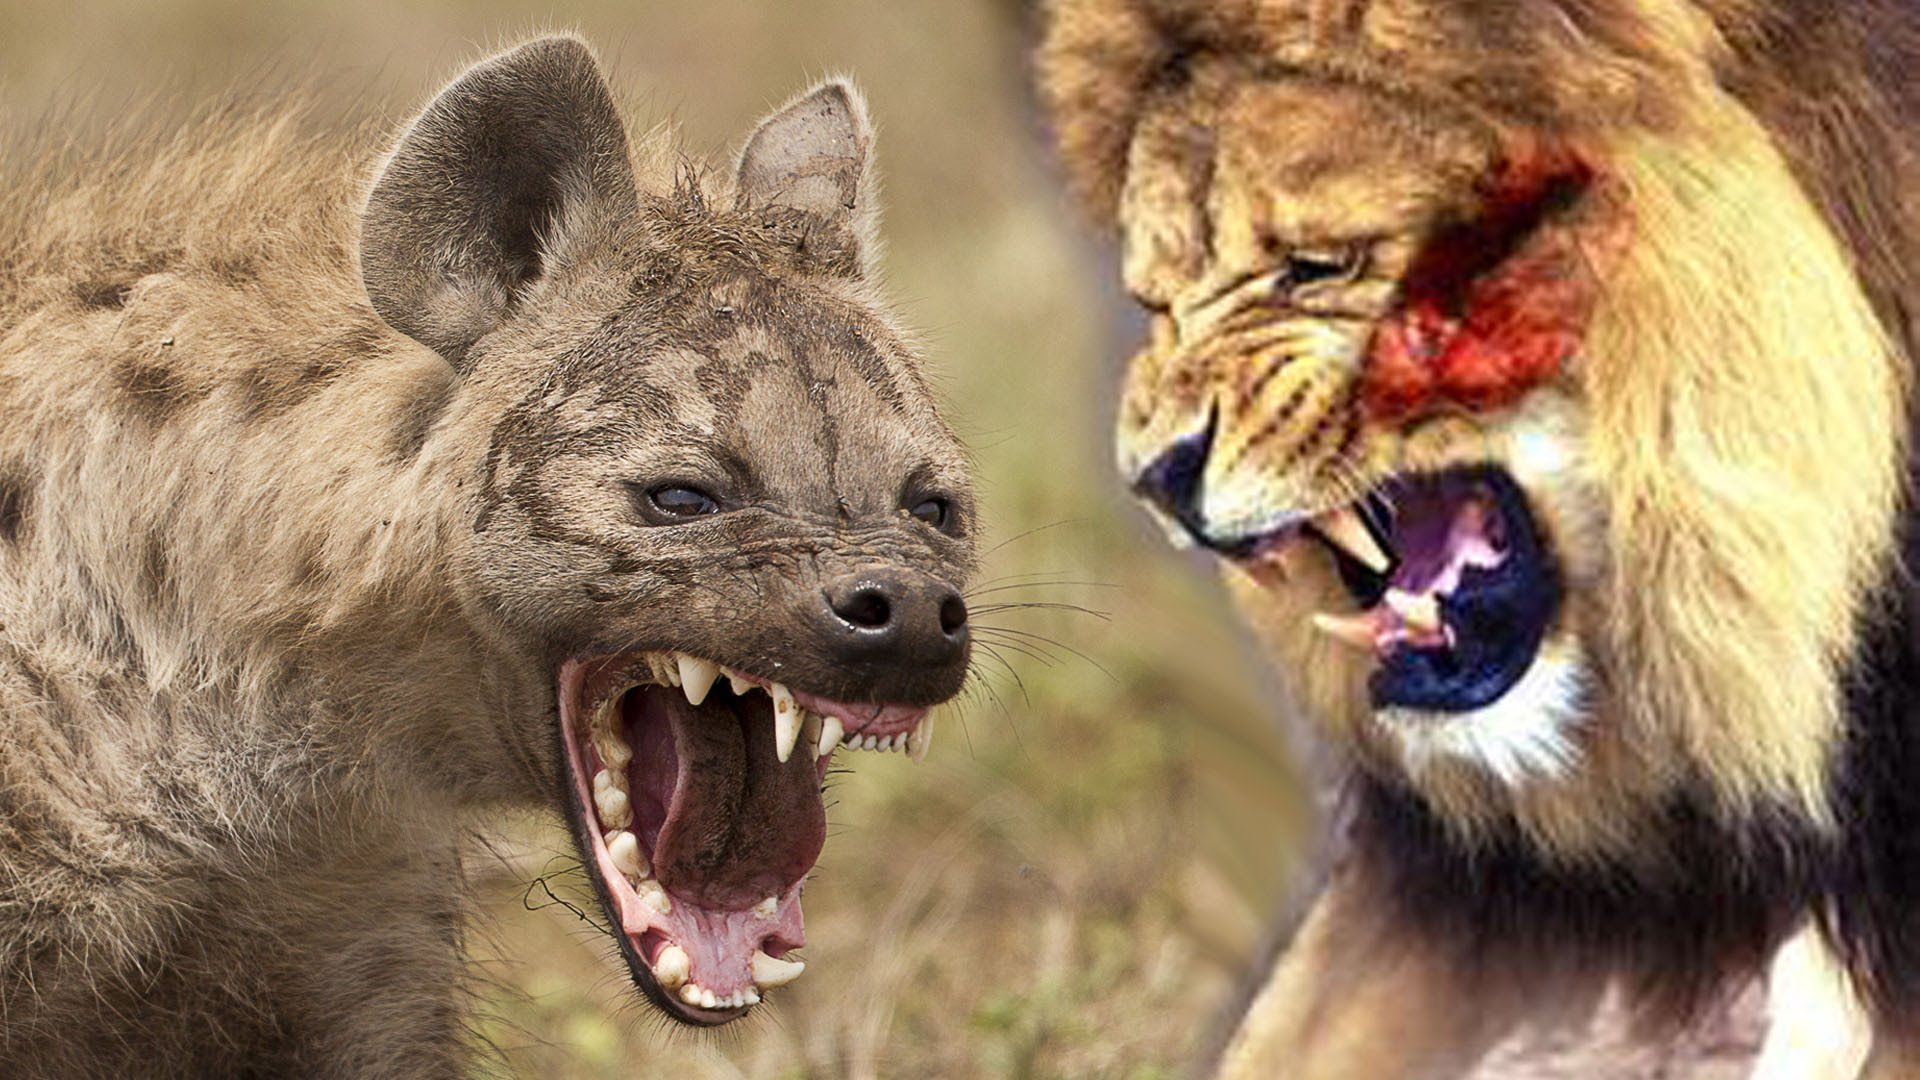 Lions Vs Hyenas - [Super Killer Machines] - National Geographic Documentary